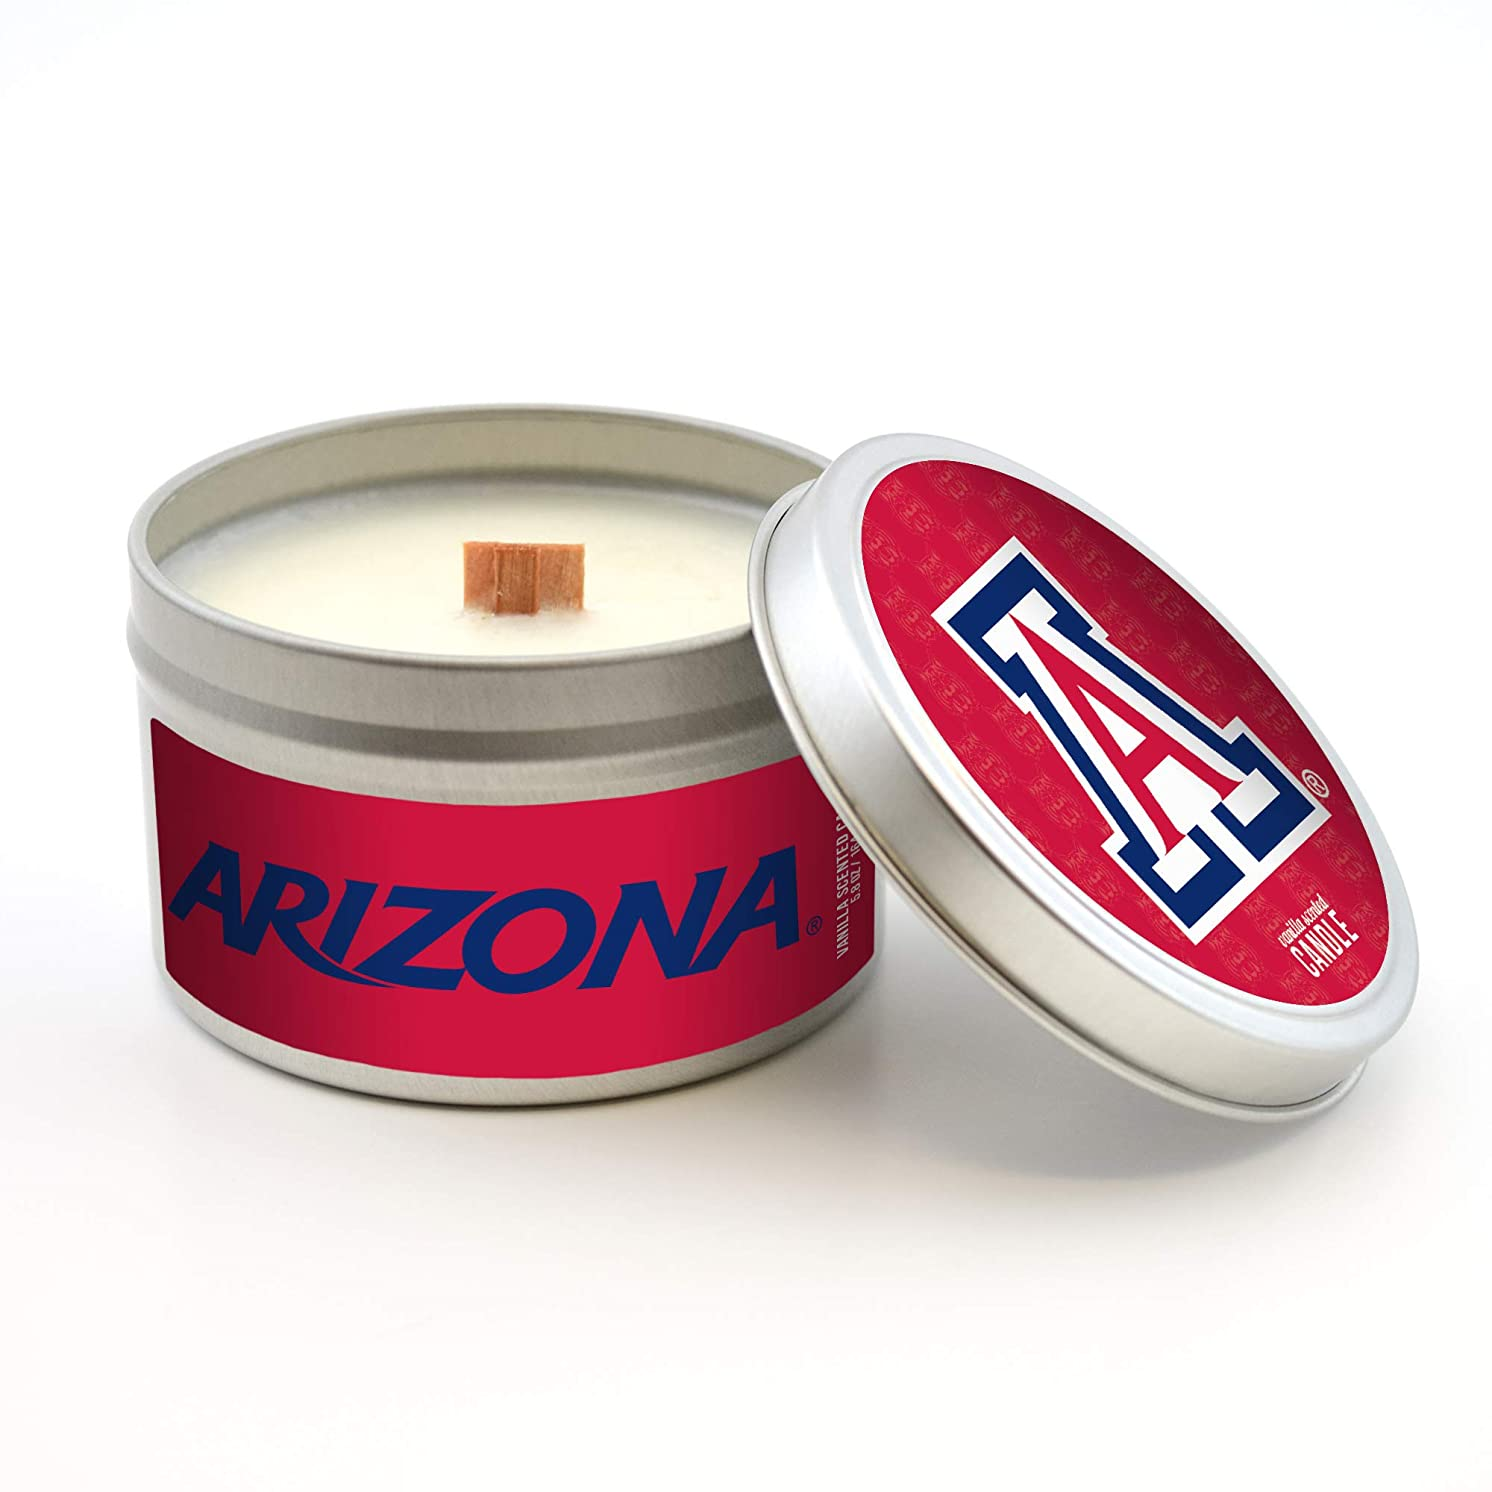 Worthy Promo NCAA Arizona Wildcats Travel Tin Candle with Wood Wick, Vanilla Scent, 5.8-Ounce, Gray